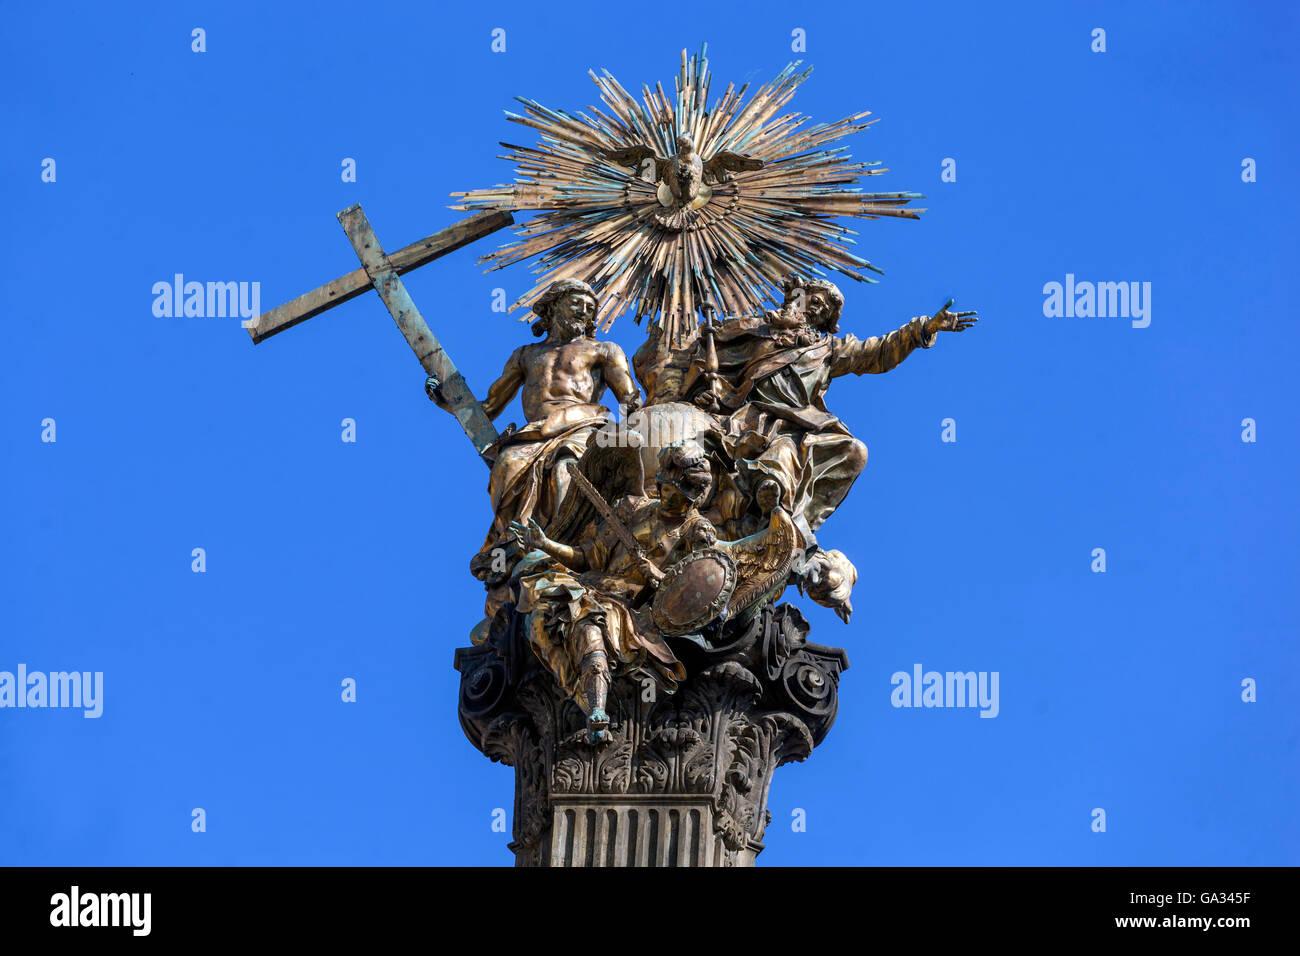 Pillar of the Holy Trinity, Olomouc, South Moravia, Czech Republic, Europe - Stock Image